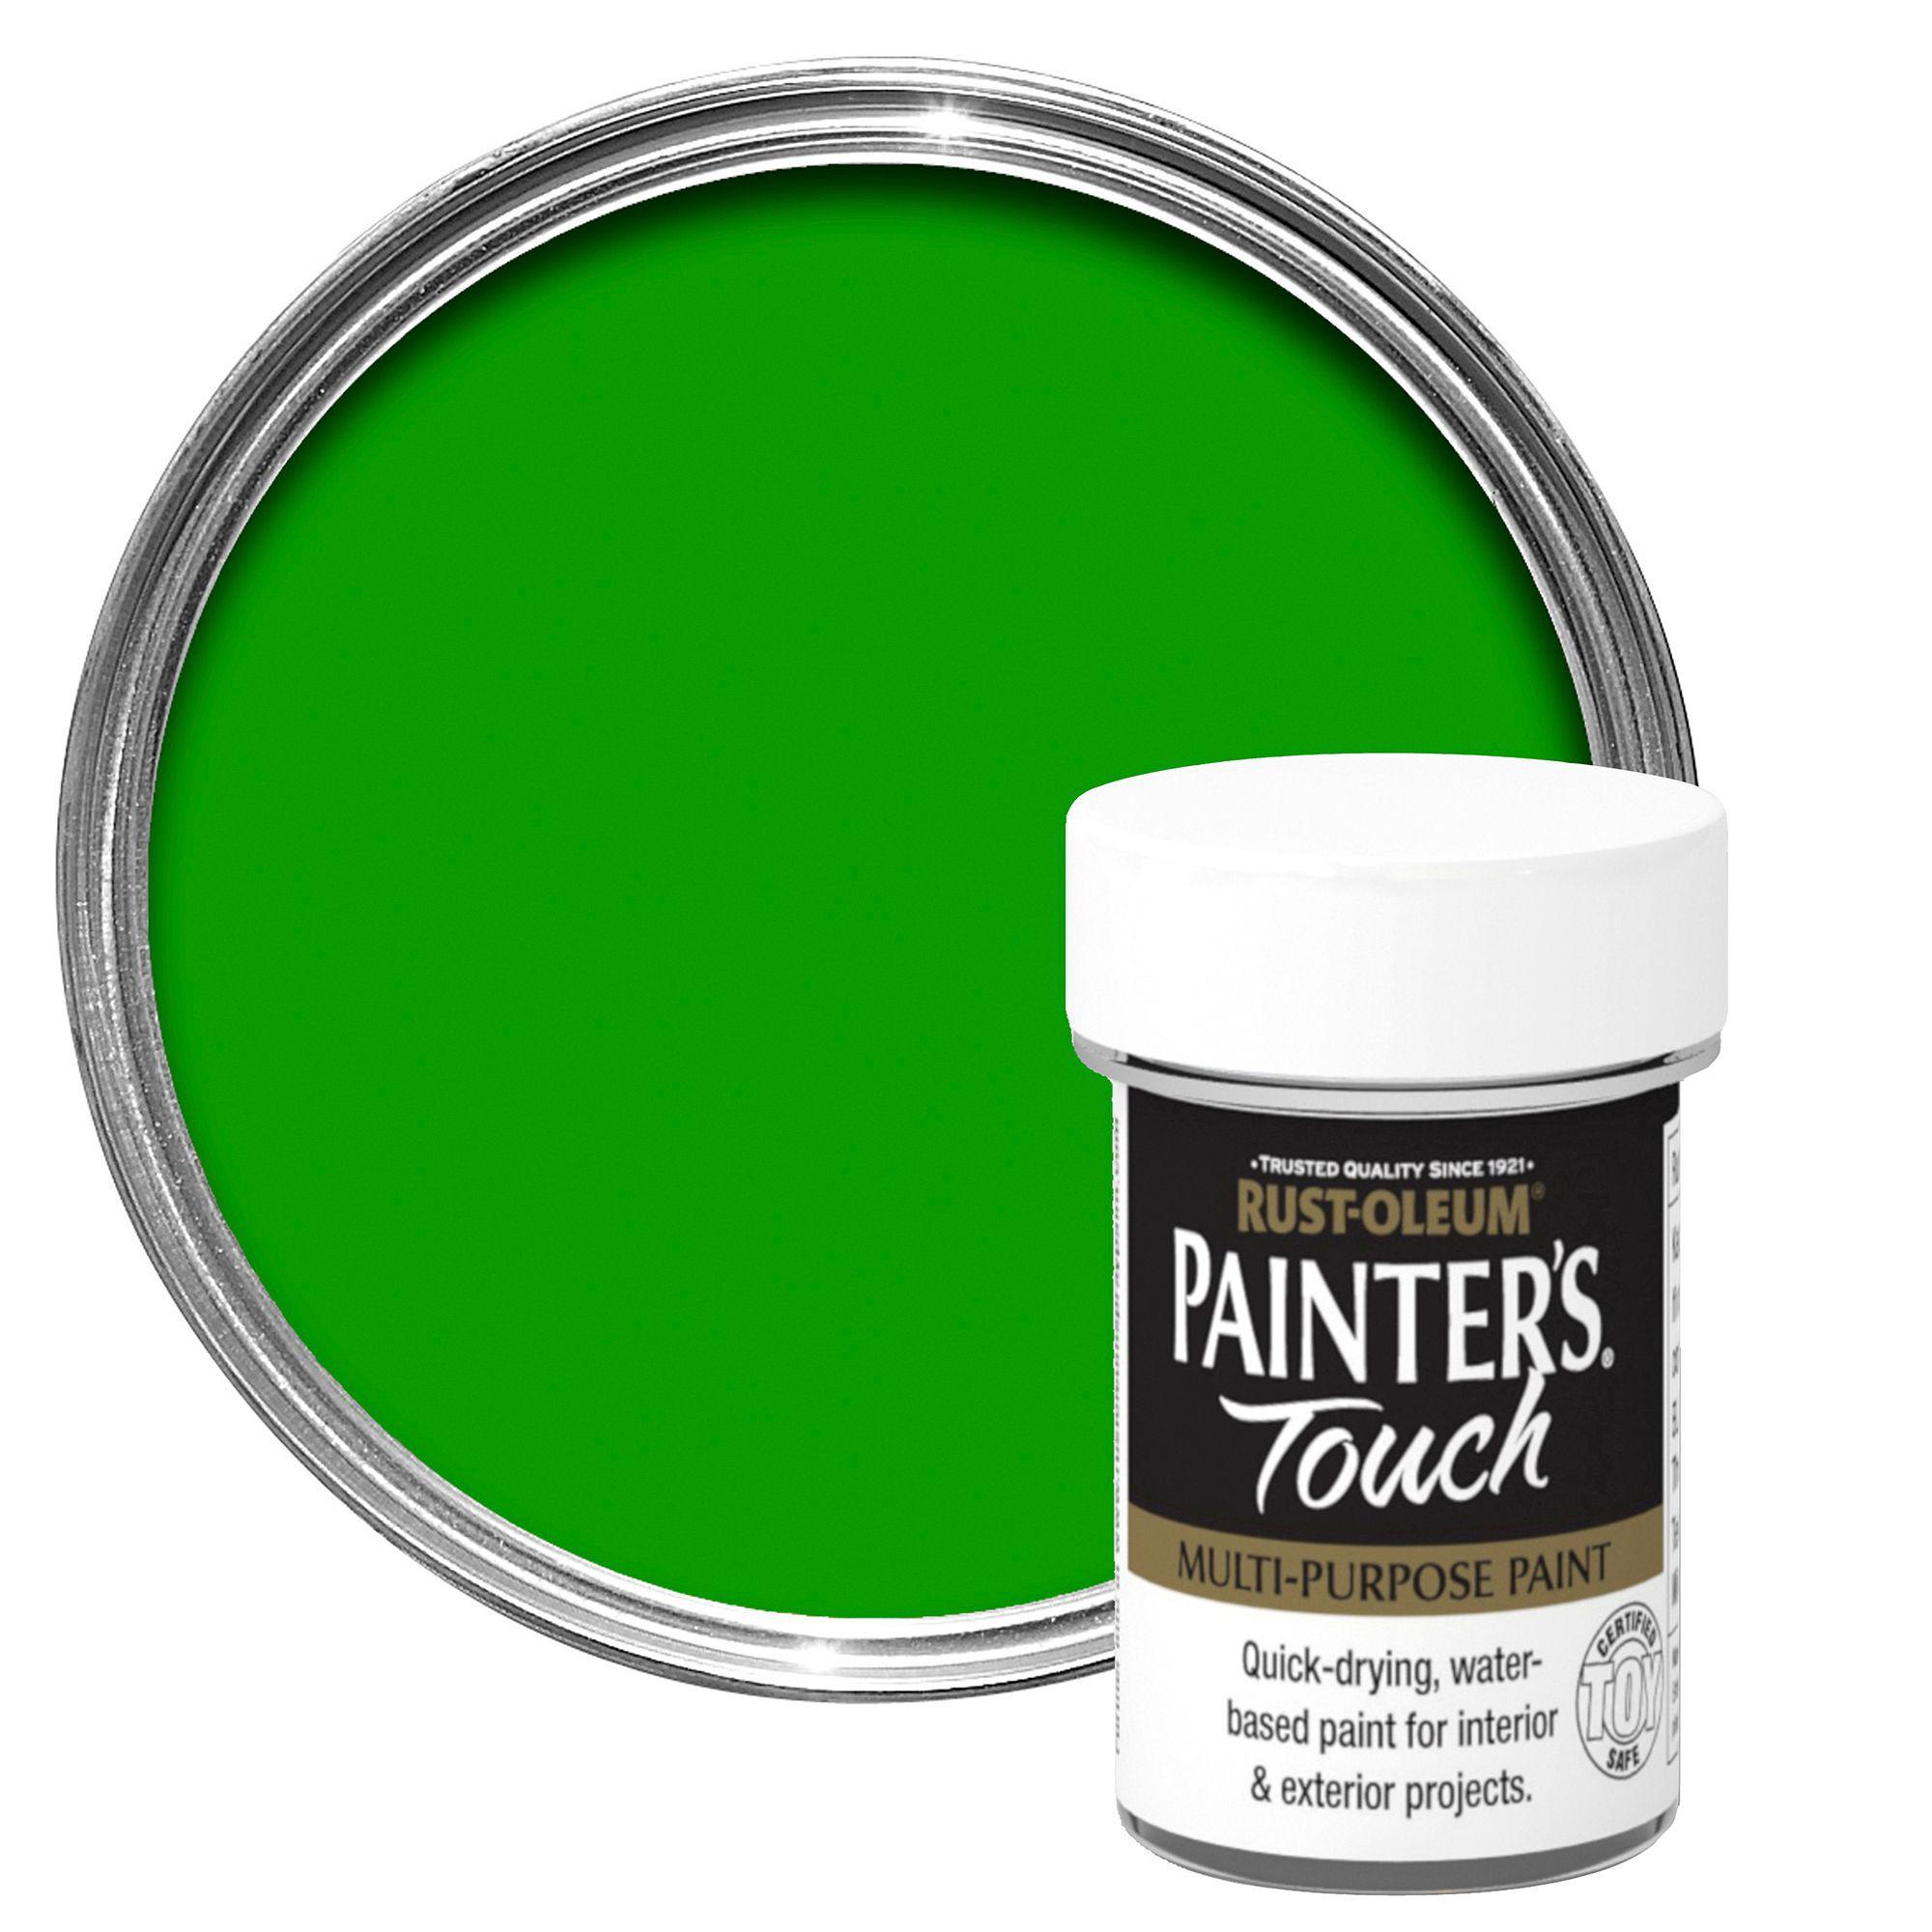 Rust-Oleum Painter's Touch Interior & Exterior Bright Green Gloss Multipurpose Paint 20ml